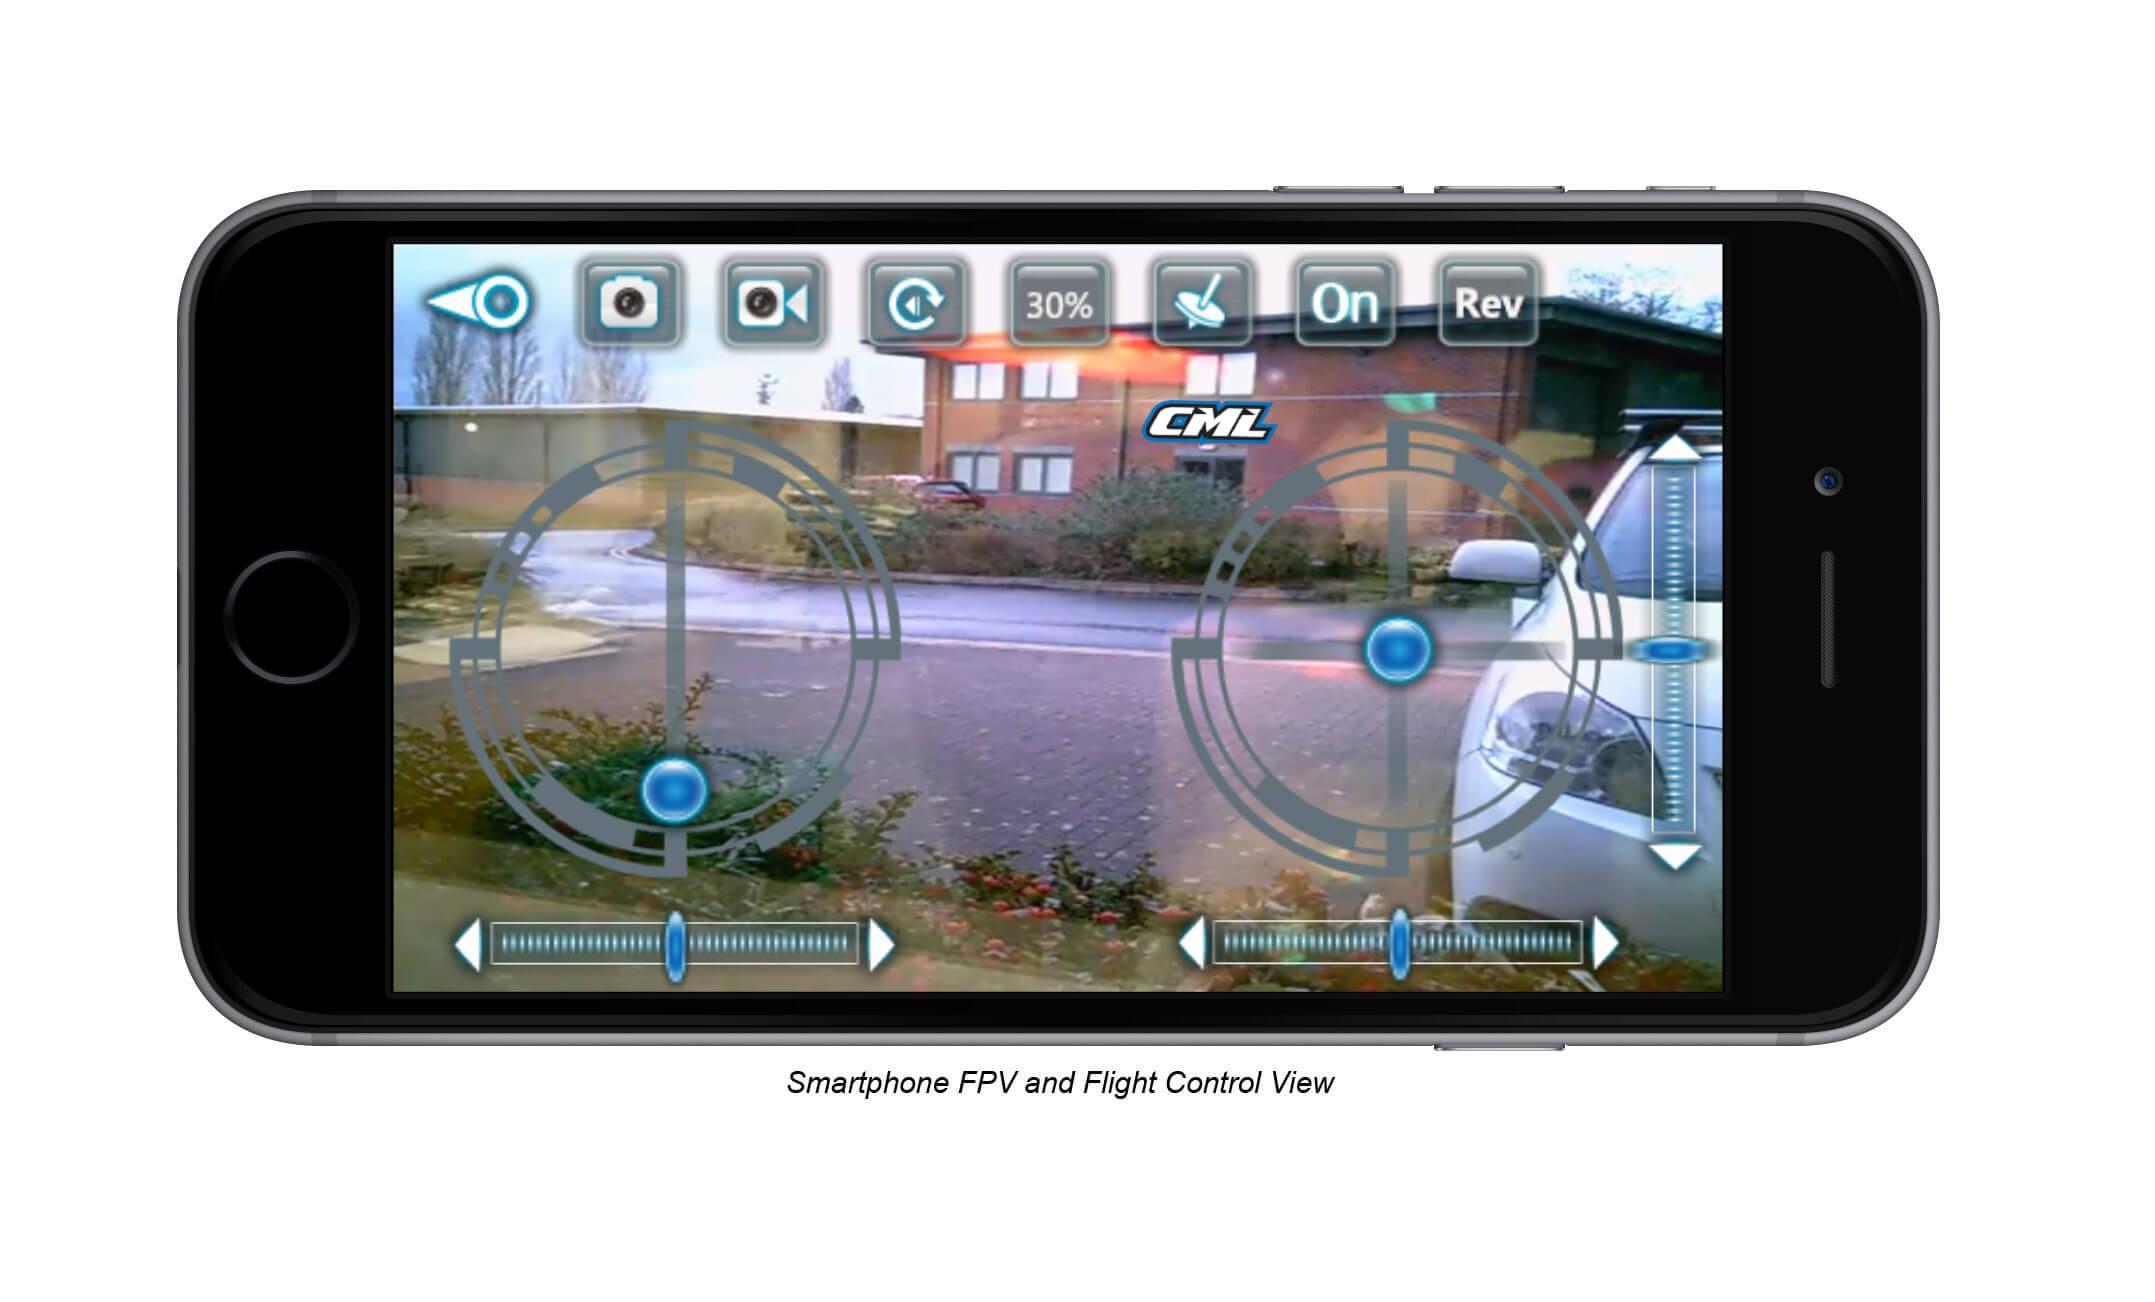 X260 Smartphone View